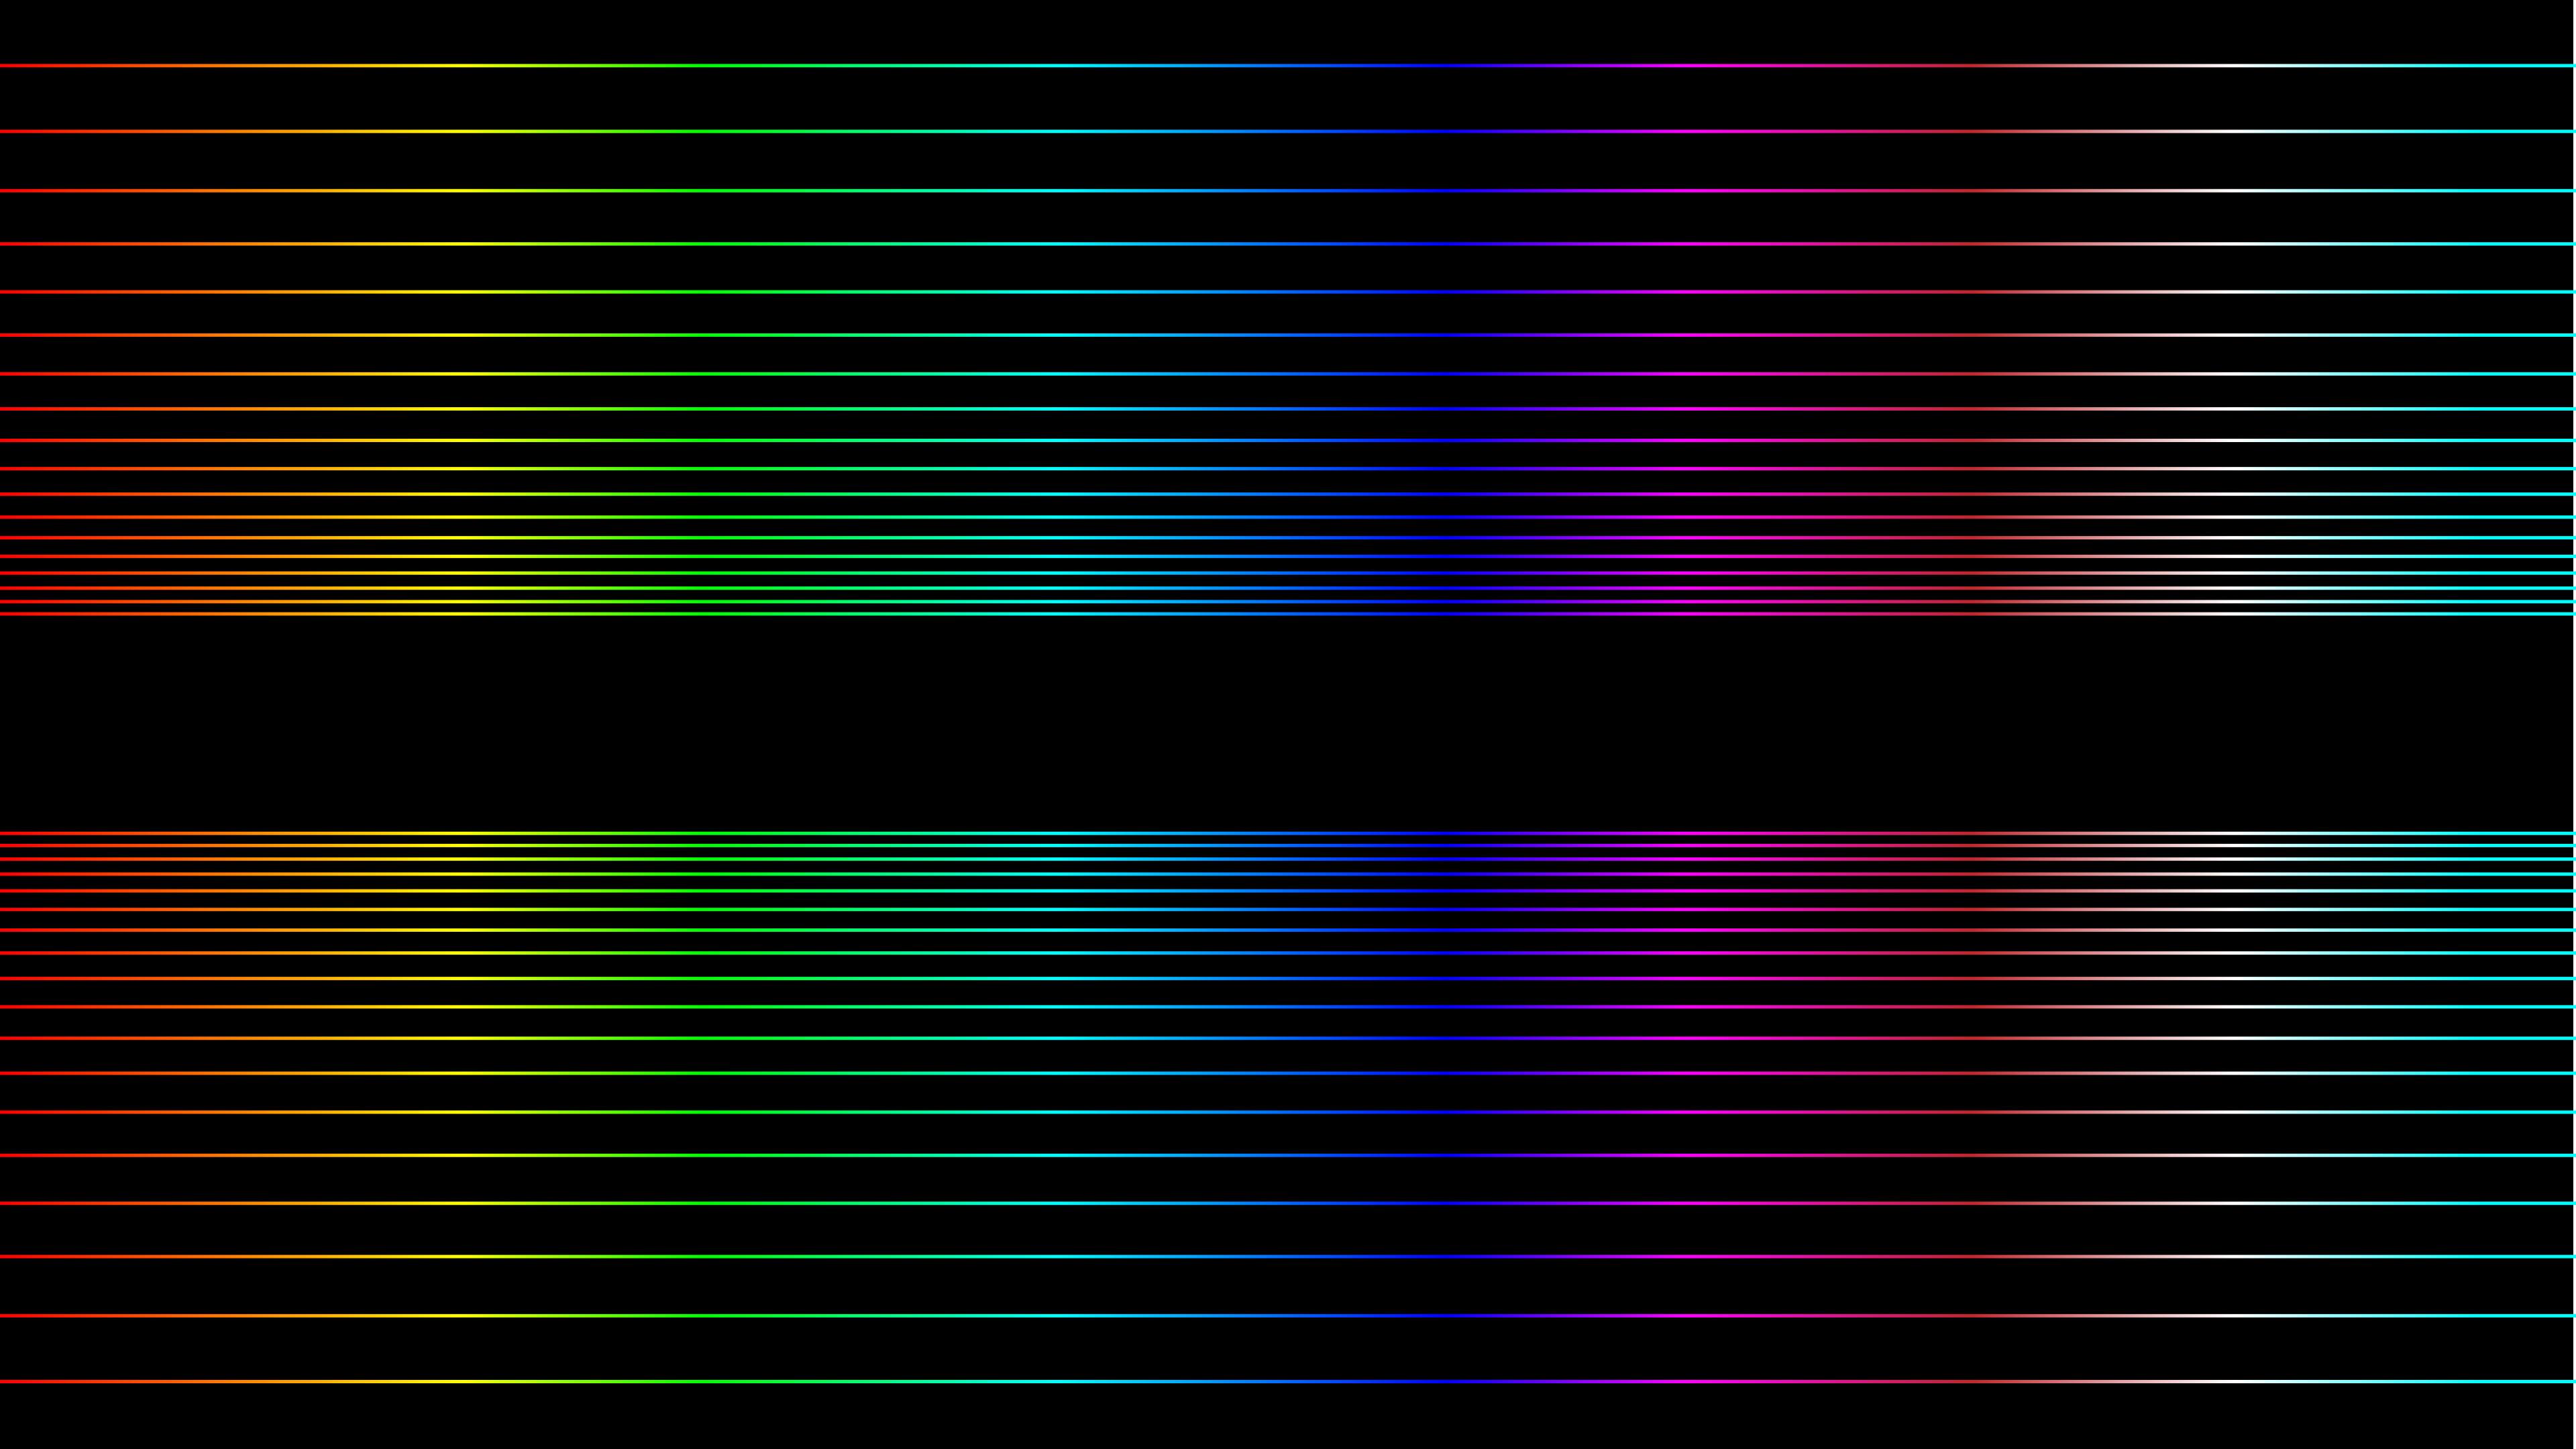 retro wave gradient lines 8k qm 3840x2160 1 - Retro Wave -